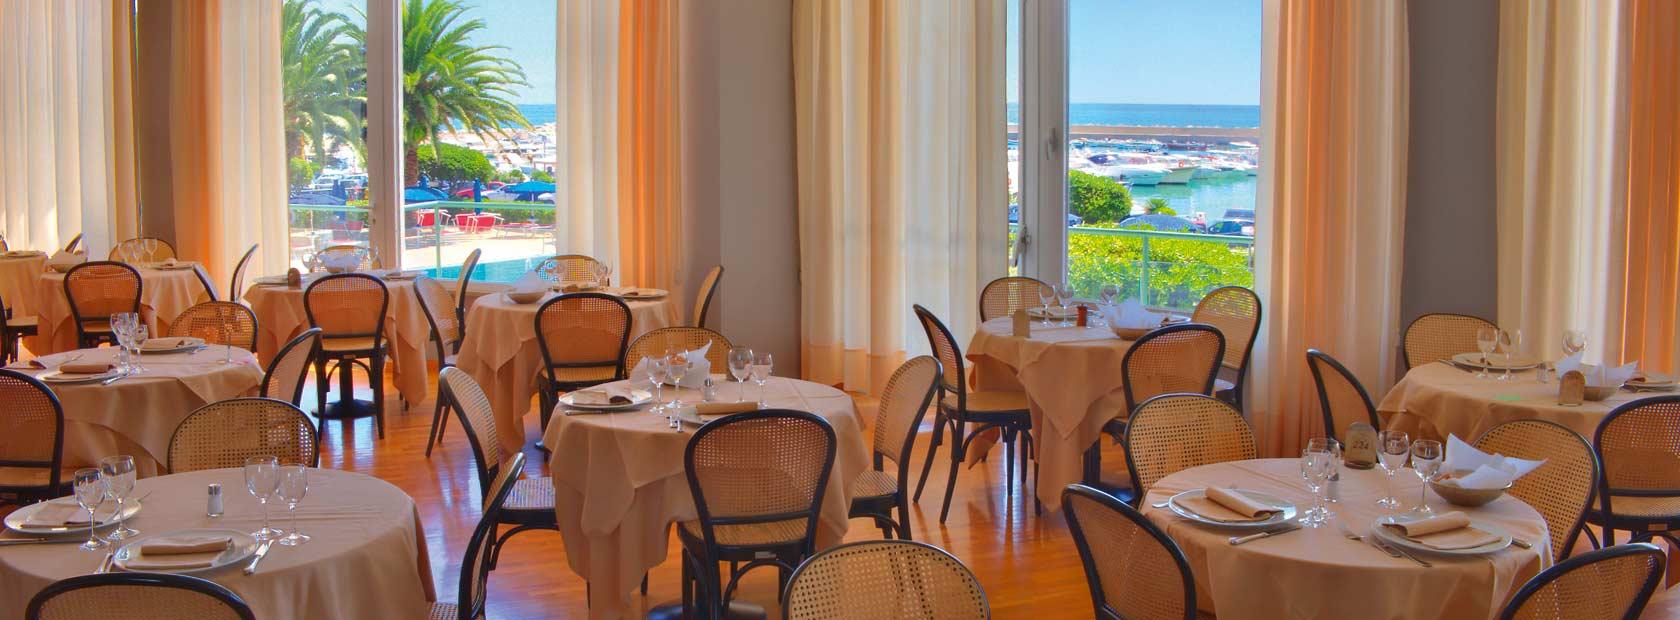 hotel-ristorante-numana-s002